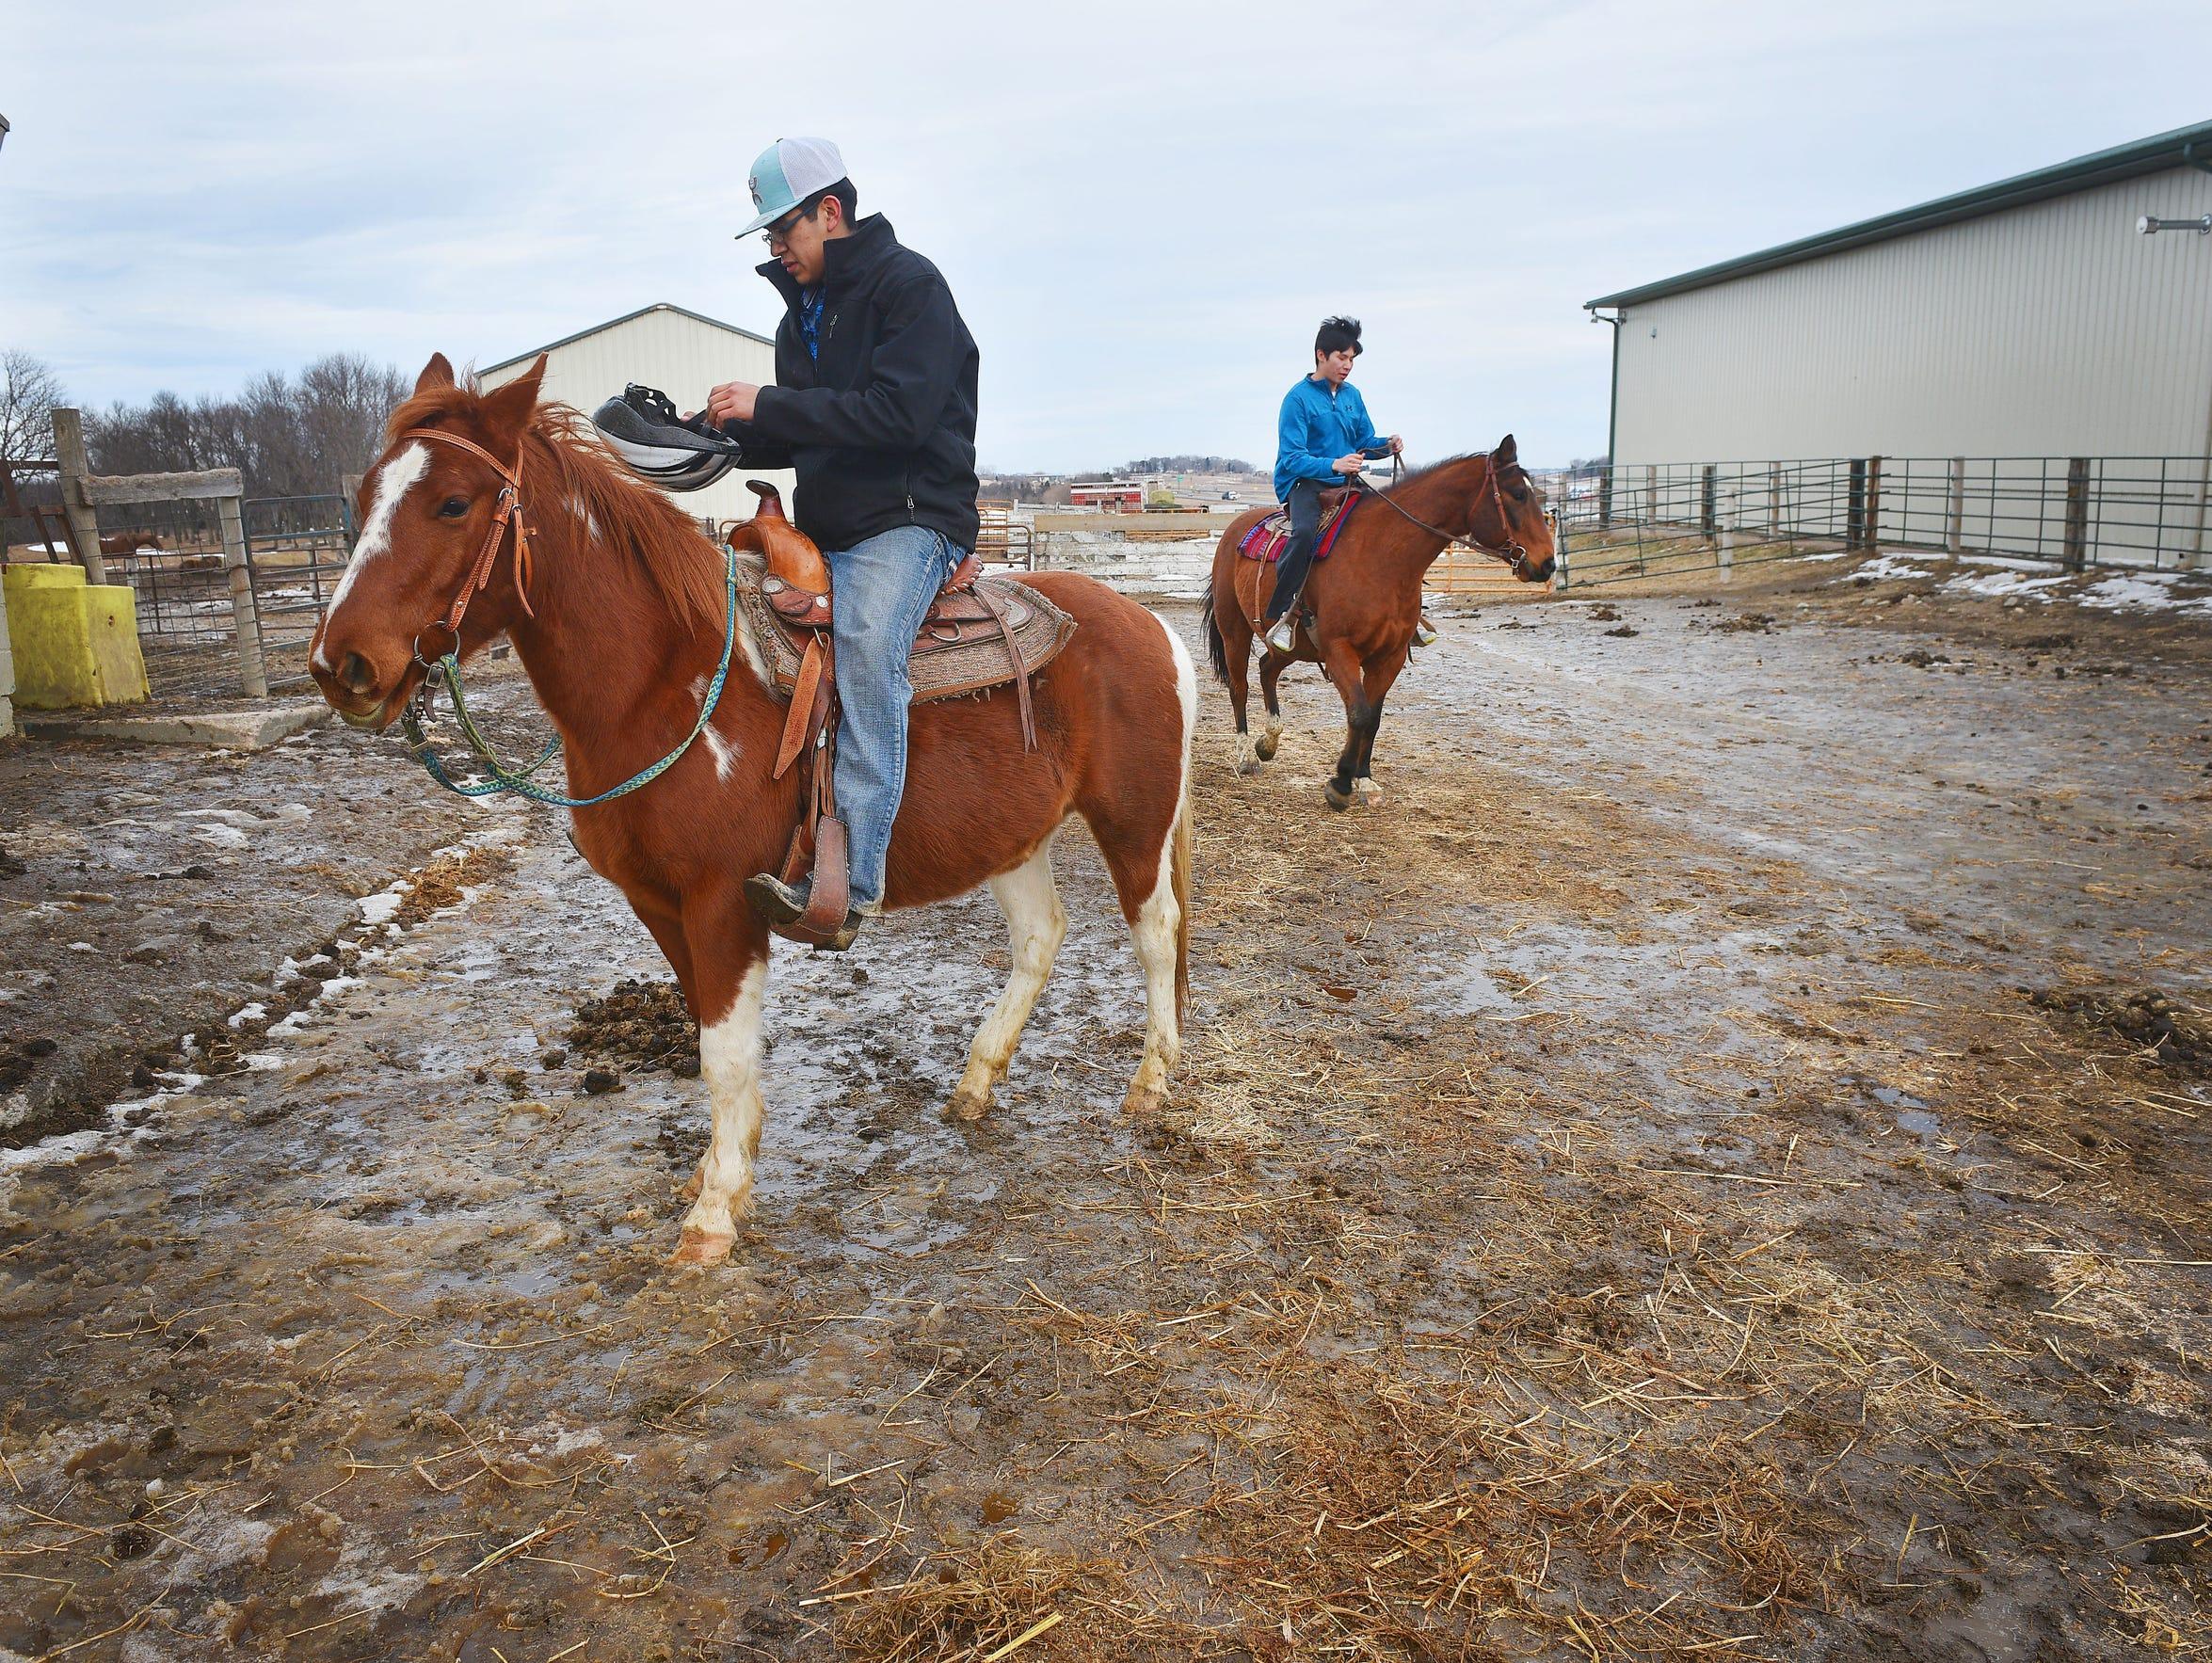 TJ, 16, left, and Omi Schulte, 20, right, ride horses